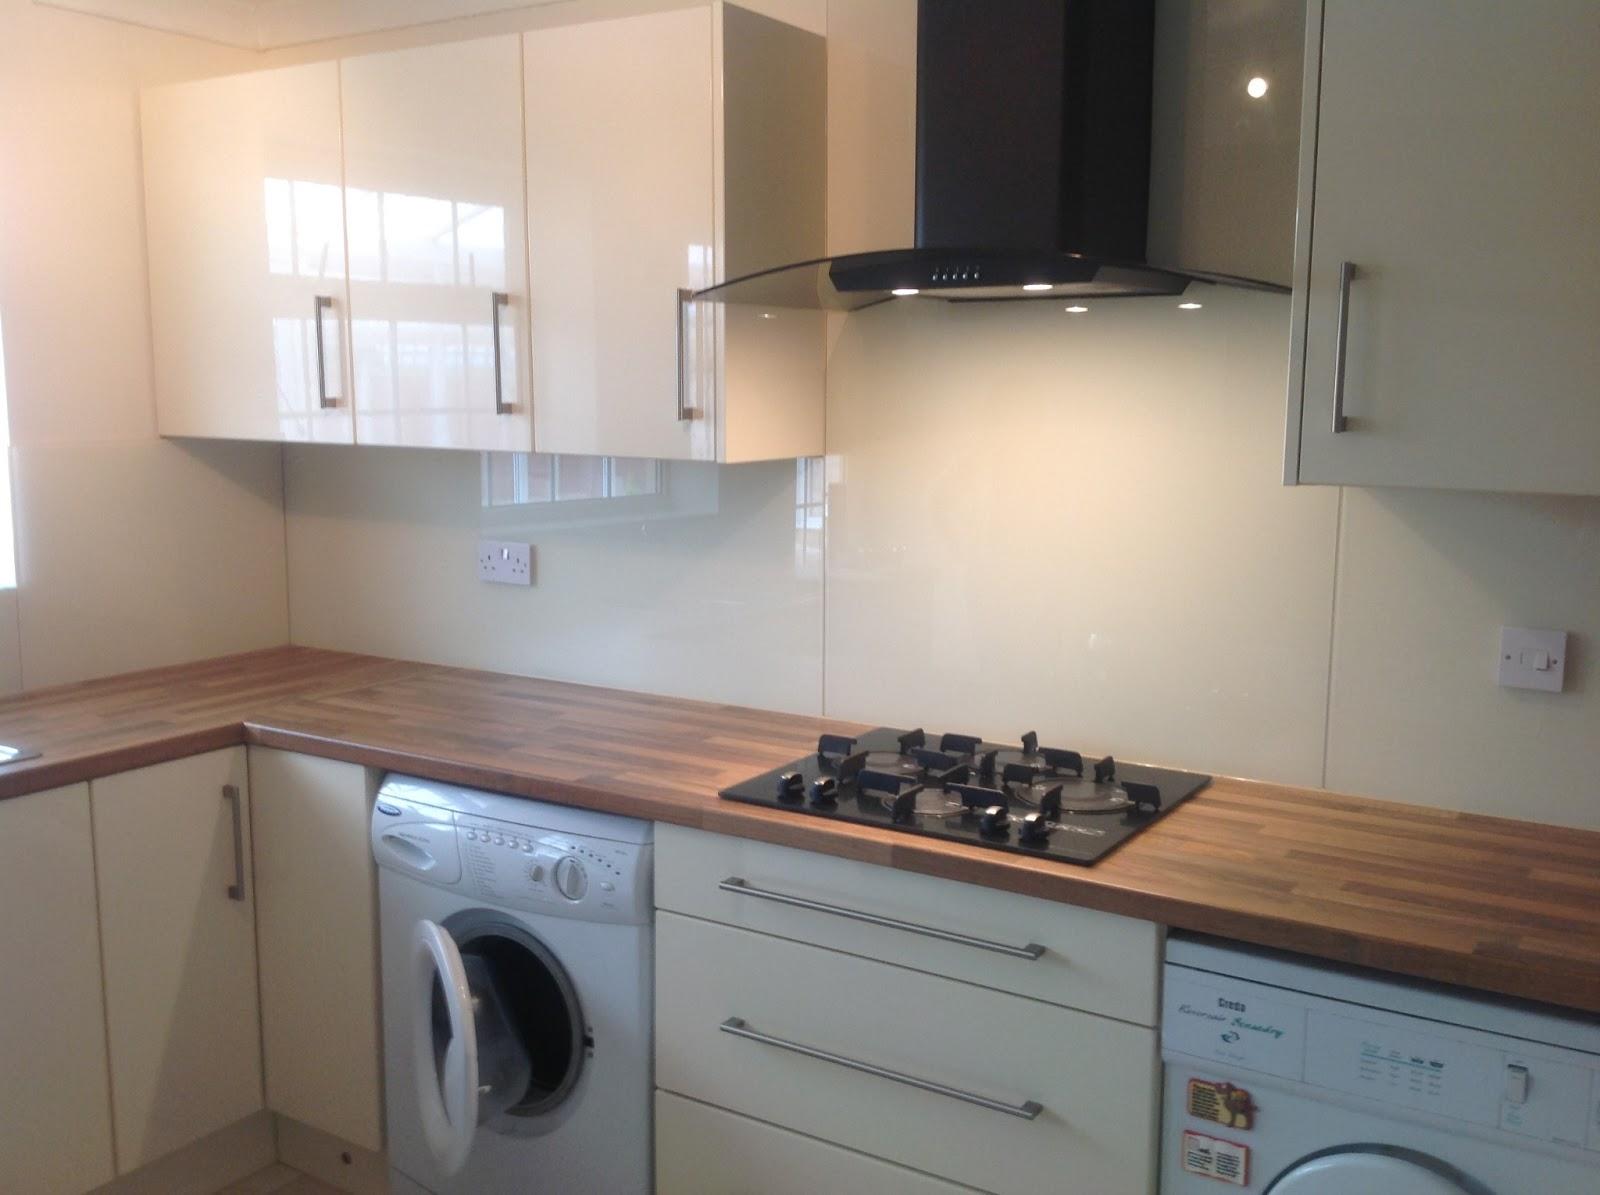 Cream Kitchen With White Appliances